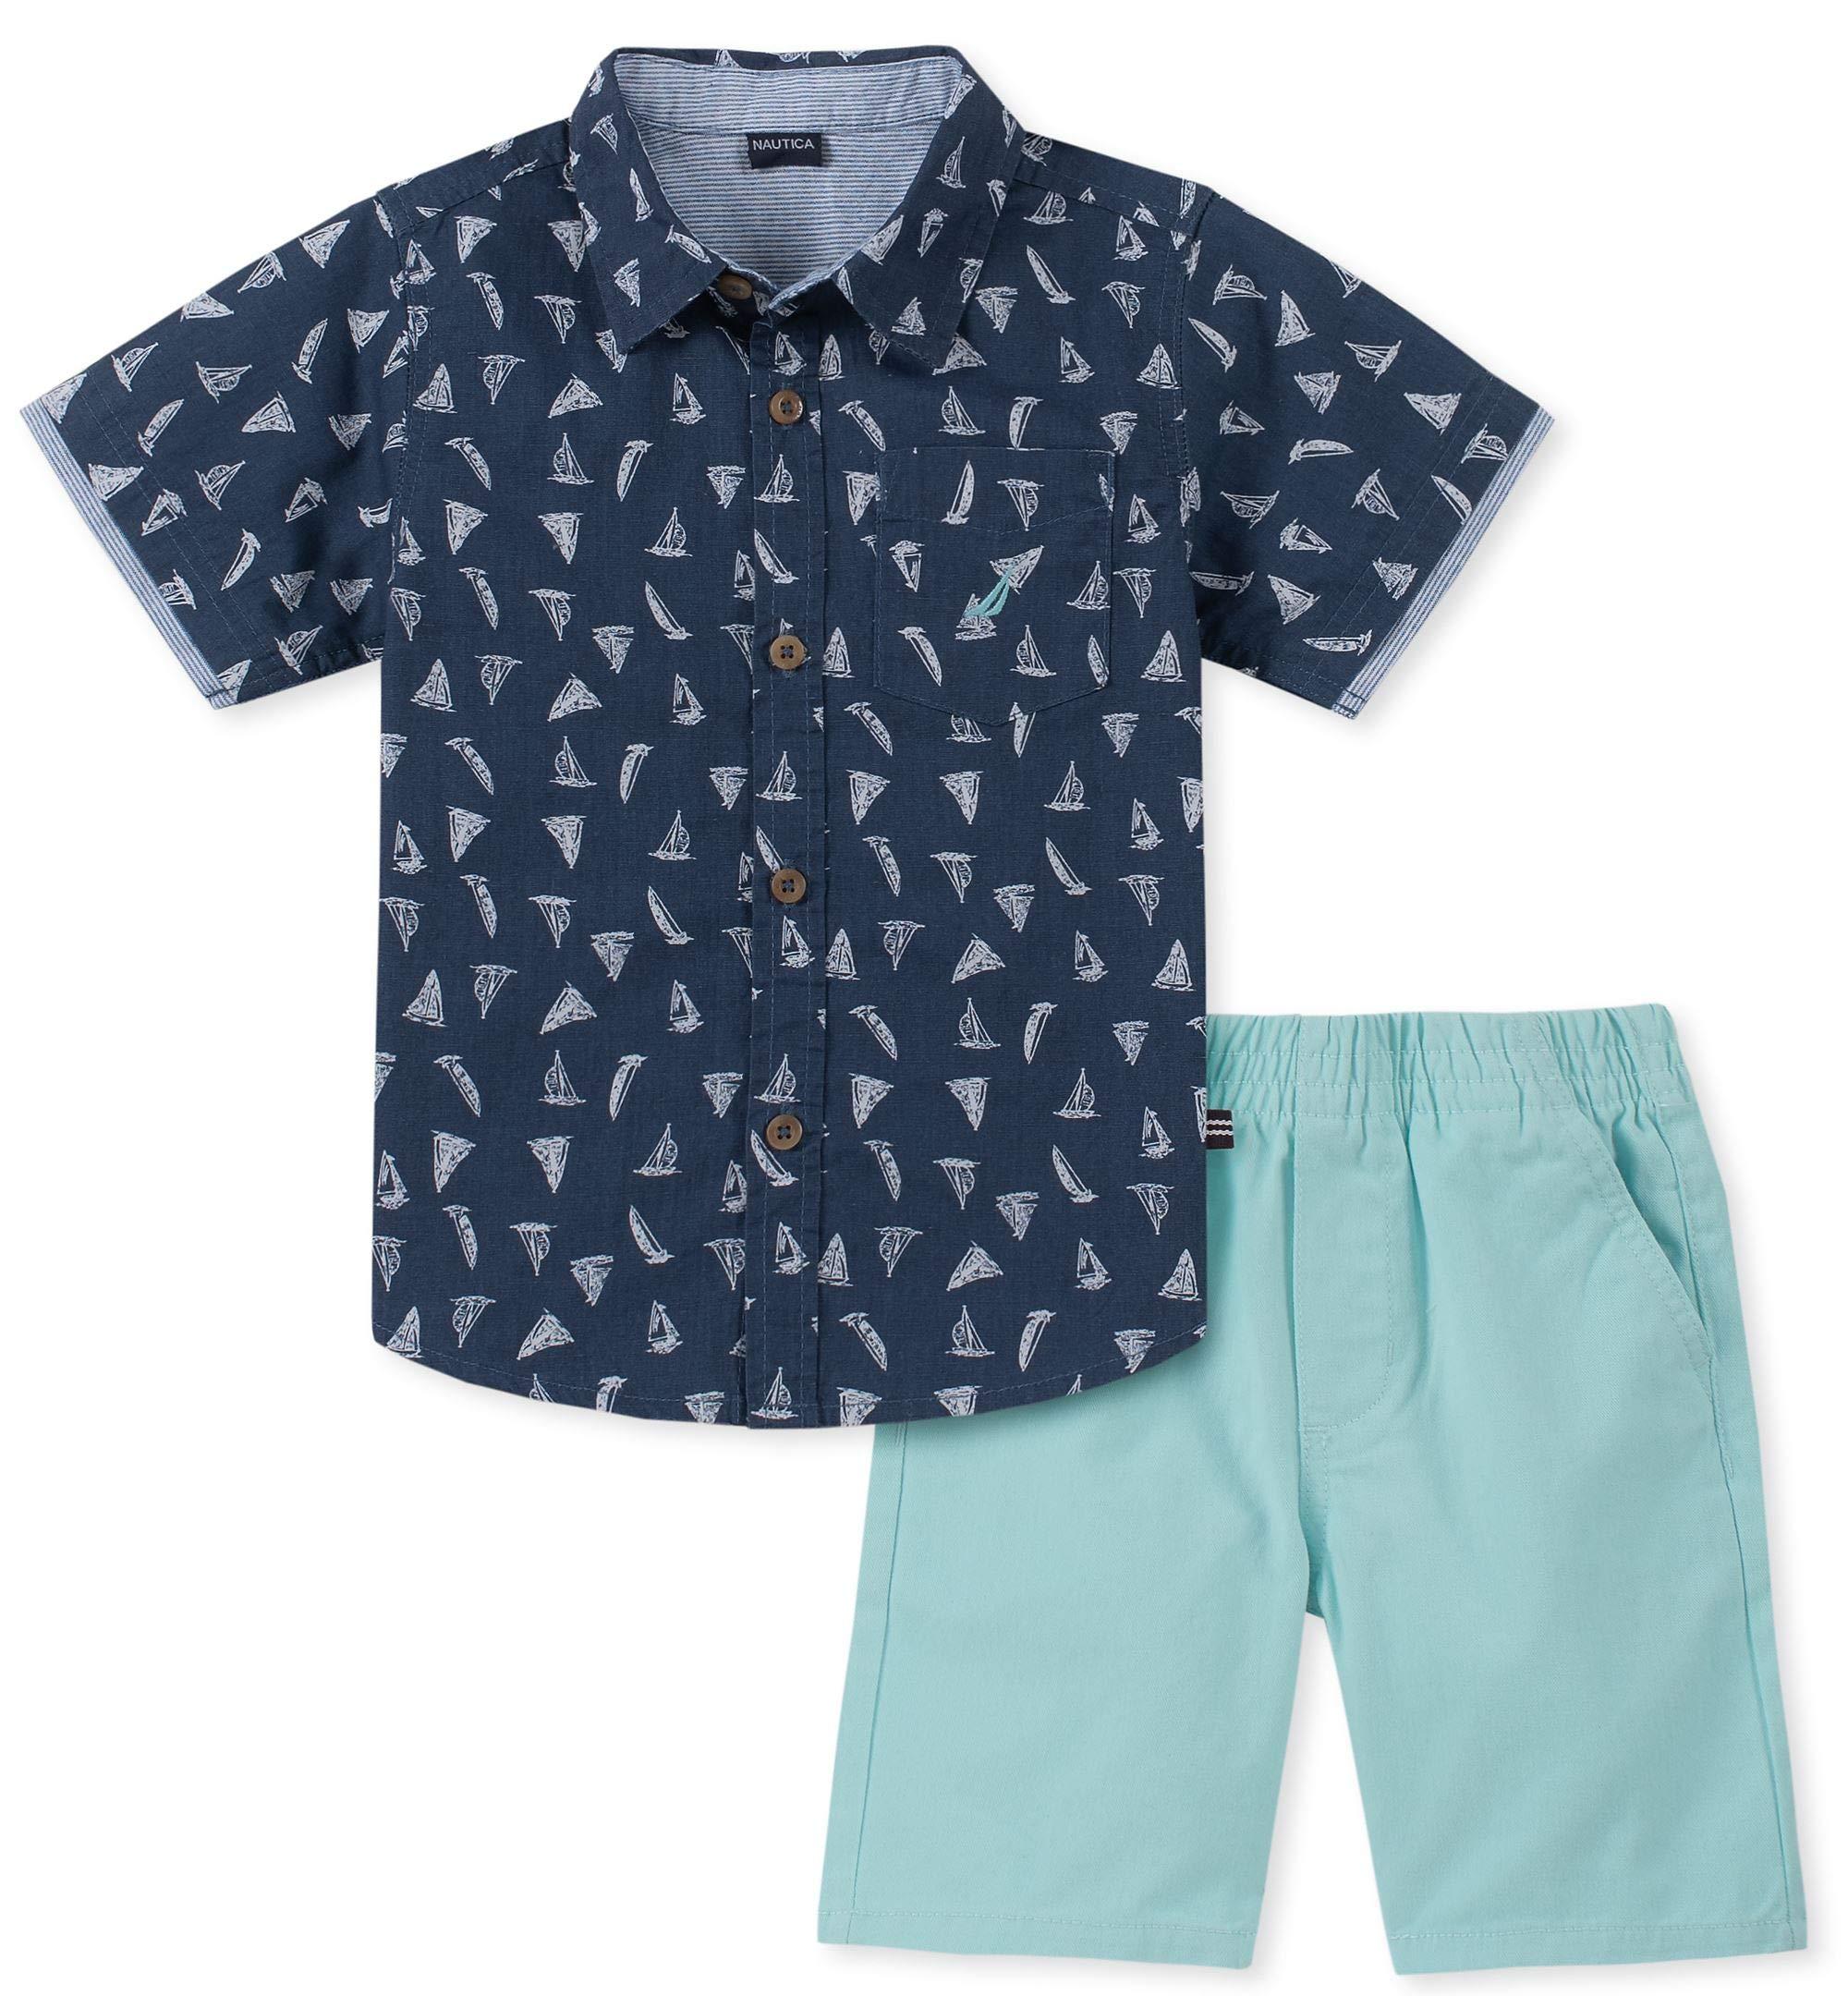 Nautica Sets (KHQ) Boys' Little 2 Pieces Shirt Shorts Set, Navy Print 6